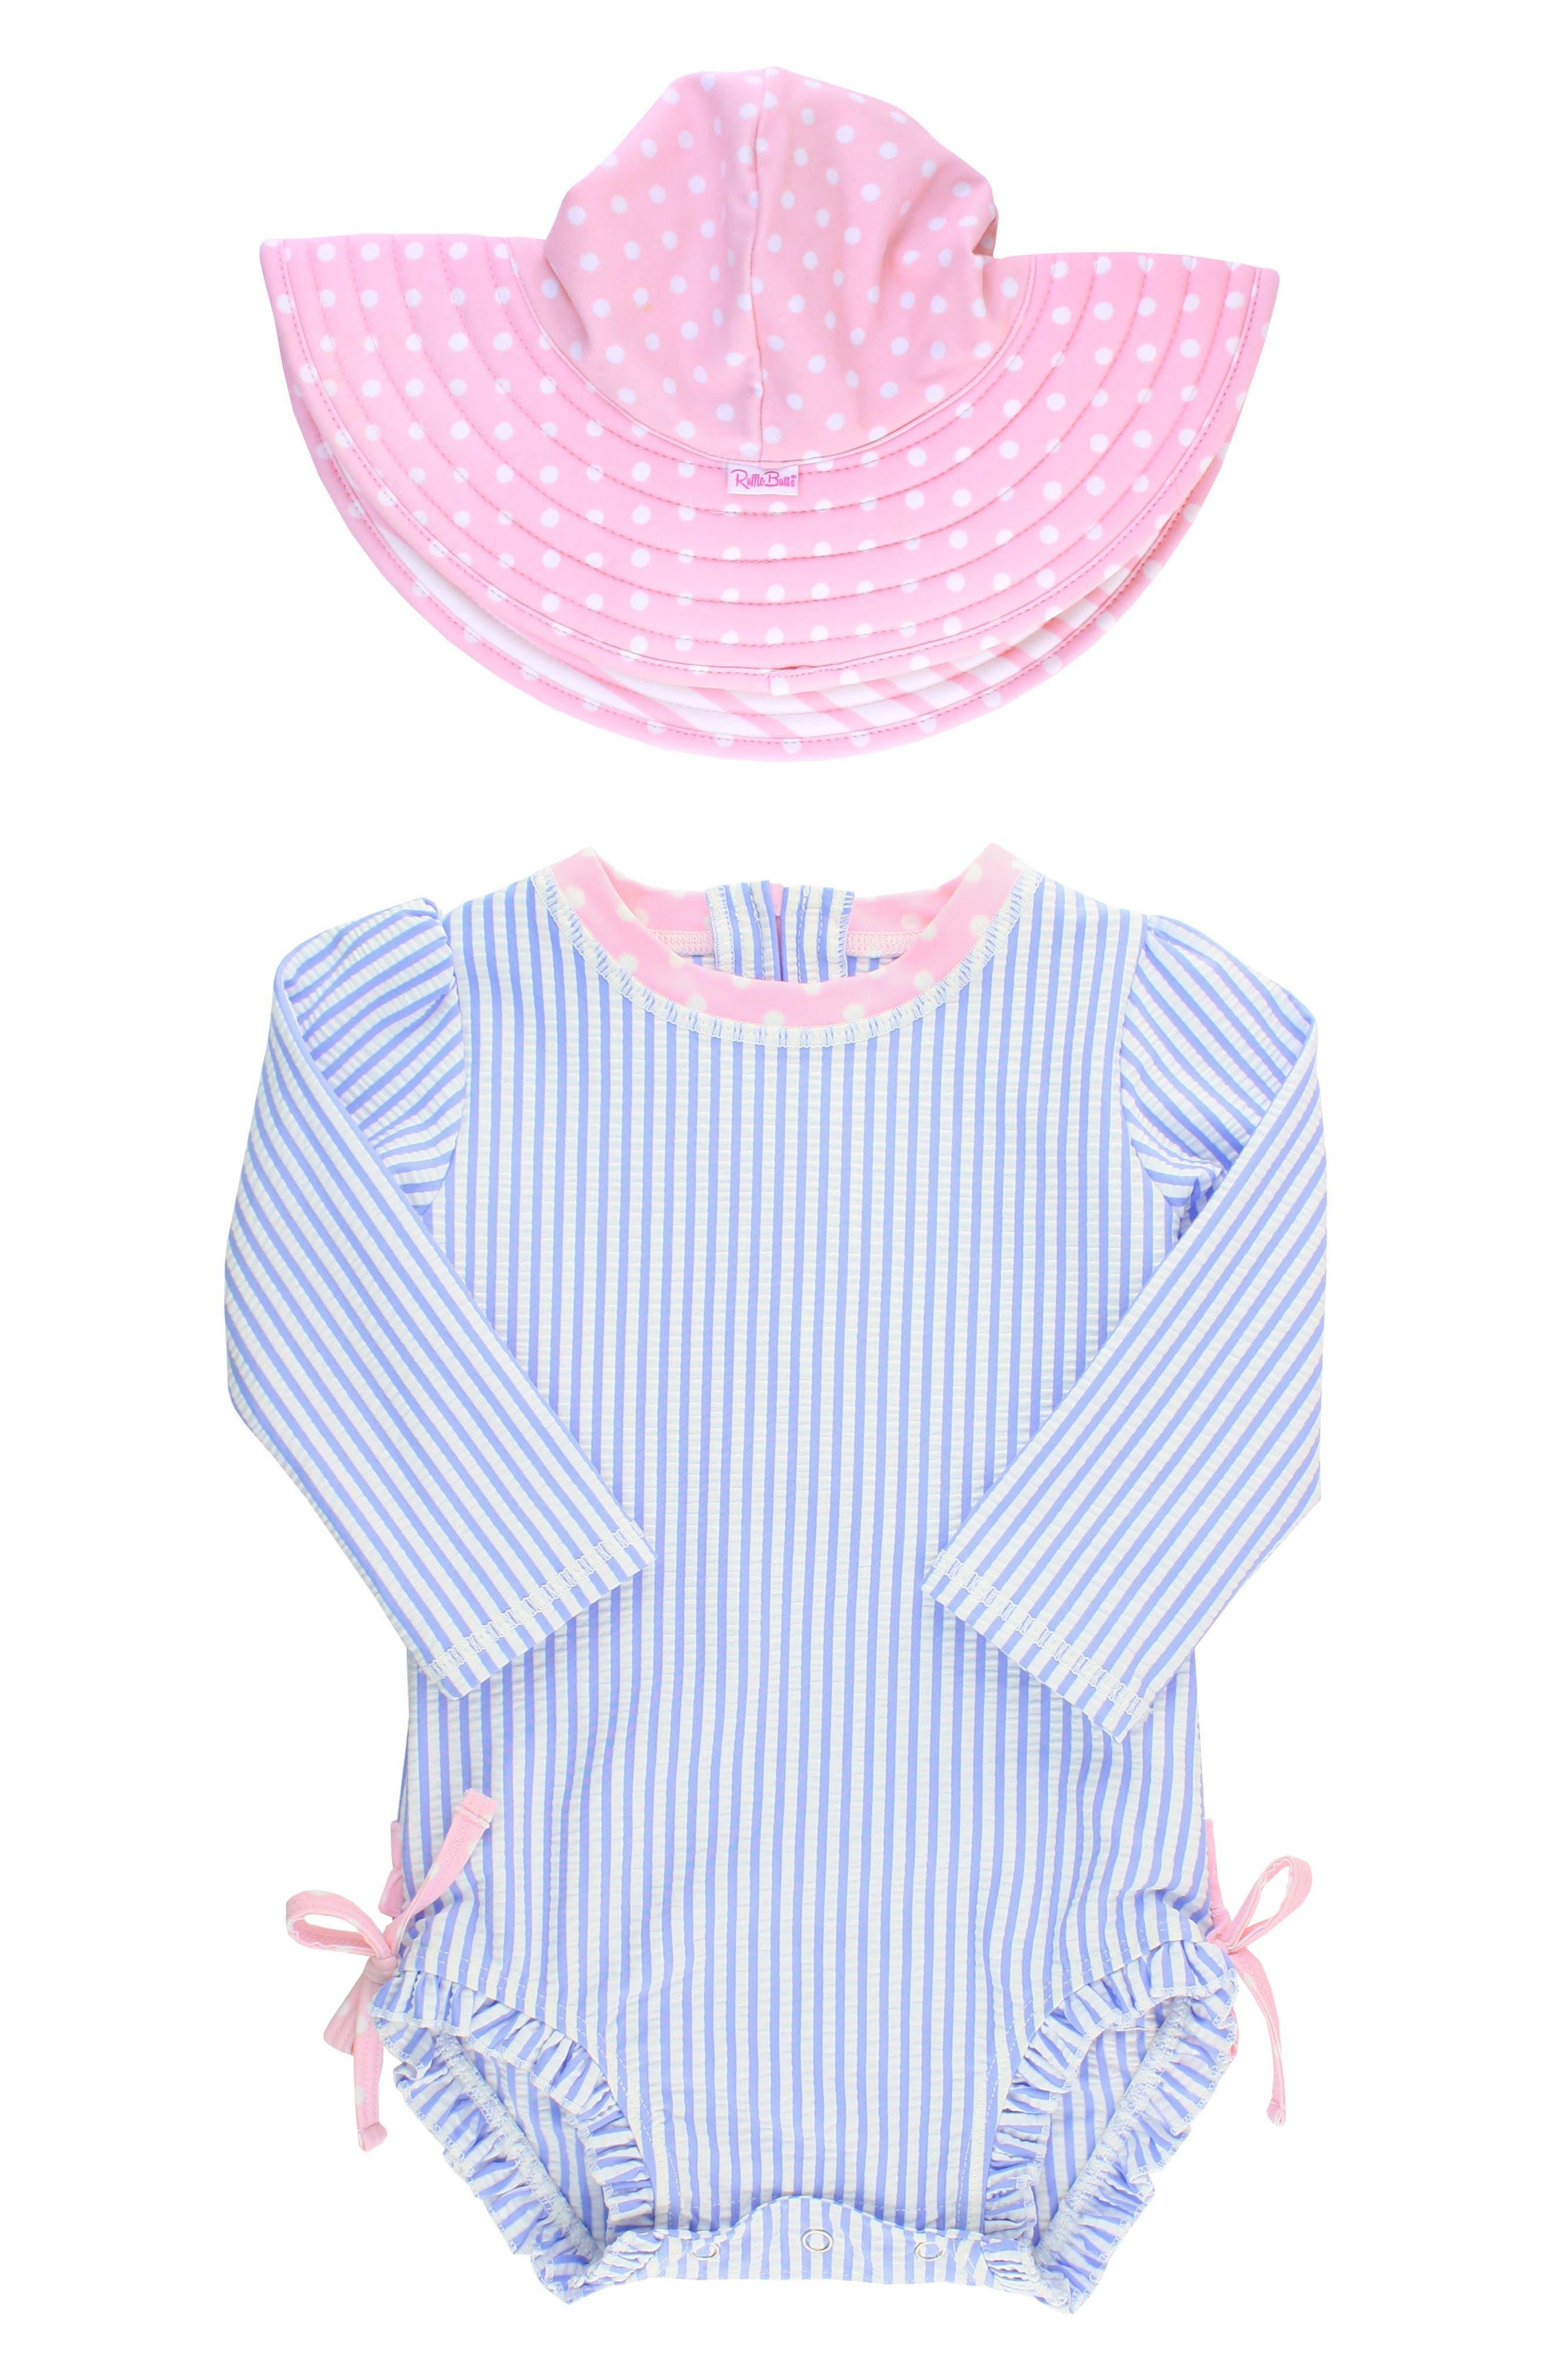 Main Image - Ruffle Butts Seersucker One-Piece Rashguard Swimsuit & Hat Set (Baby Girls)